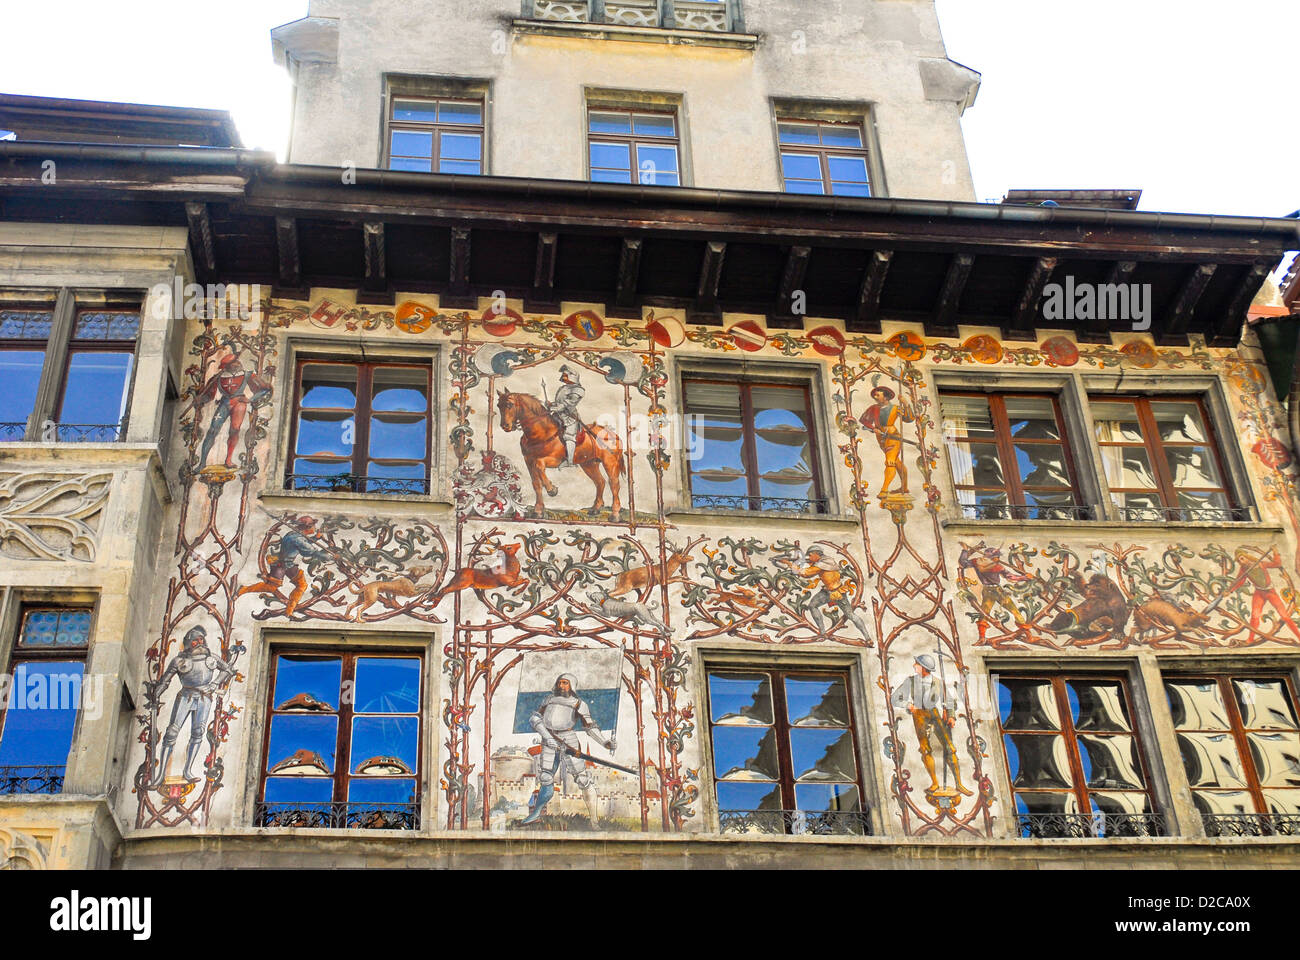 Swiss Building Facade, Lucerne, Switzerland - Stock Image